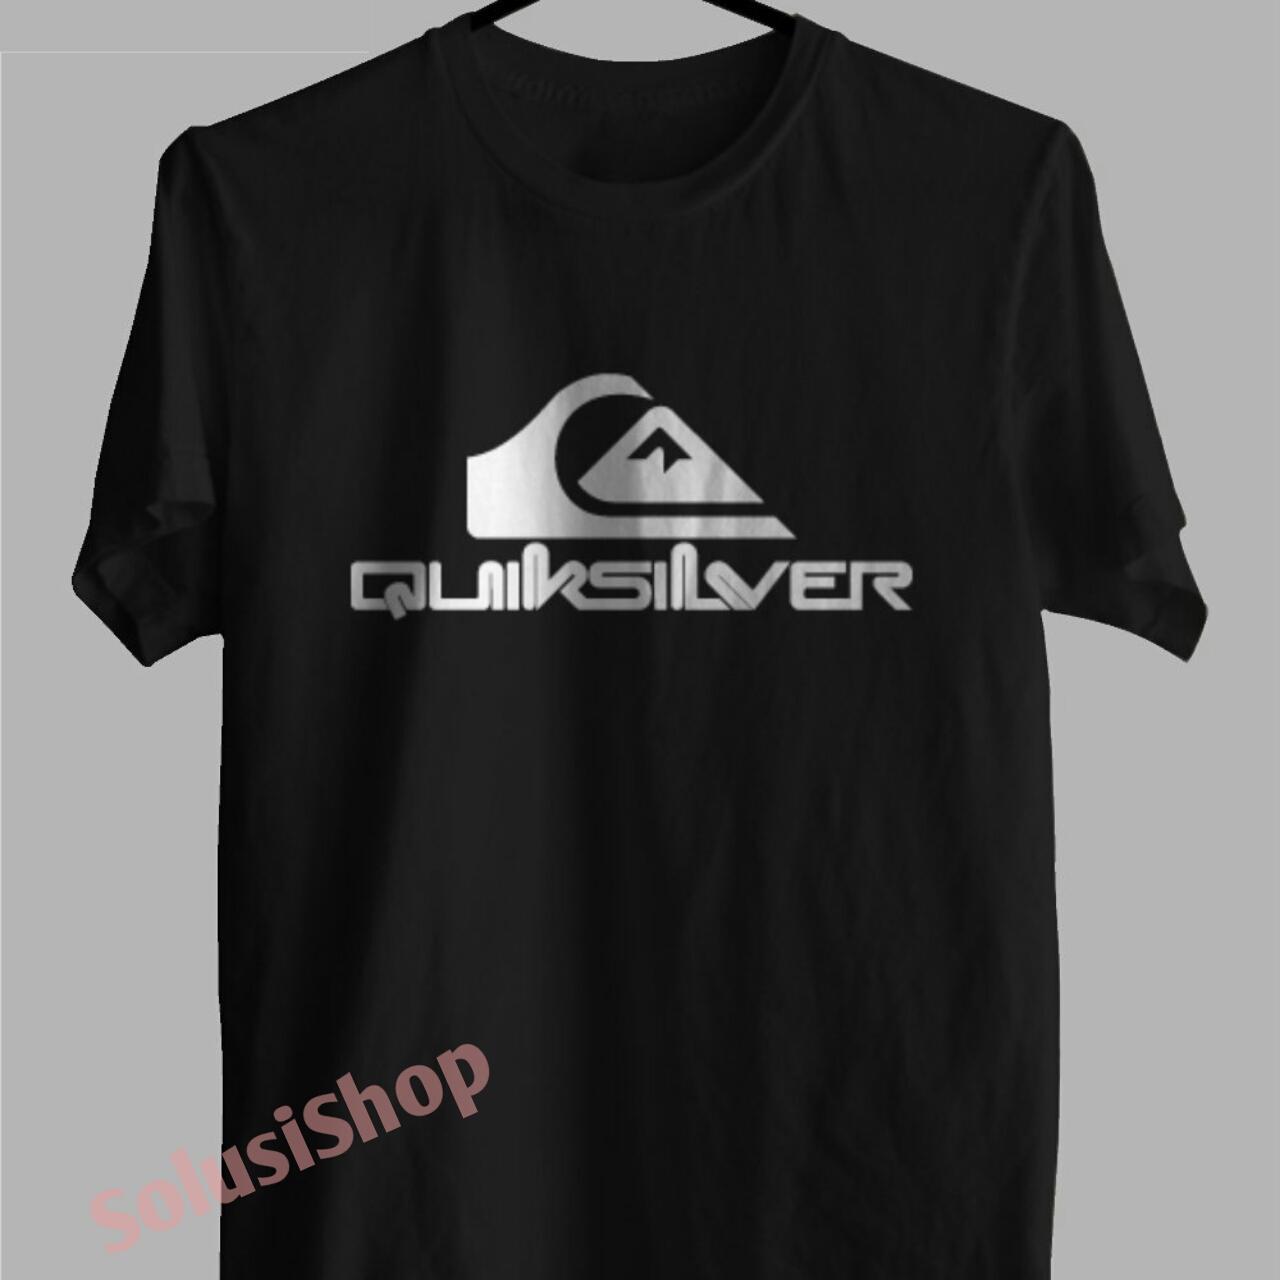 Baju Kaos Kaos Lengan Pendek Quiksilver Logo Texs Putih Solusi Shop Distro Premium